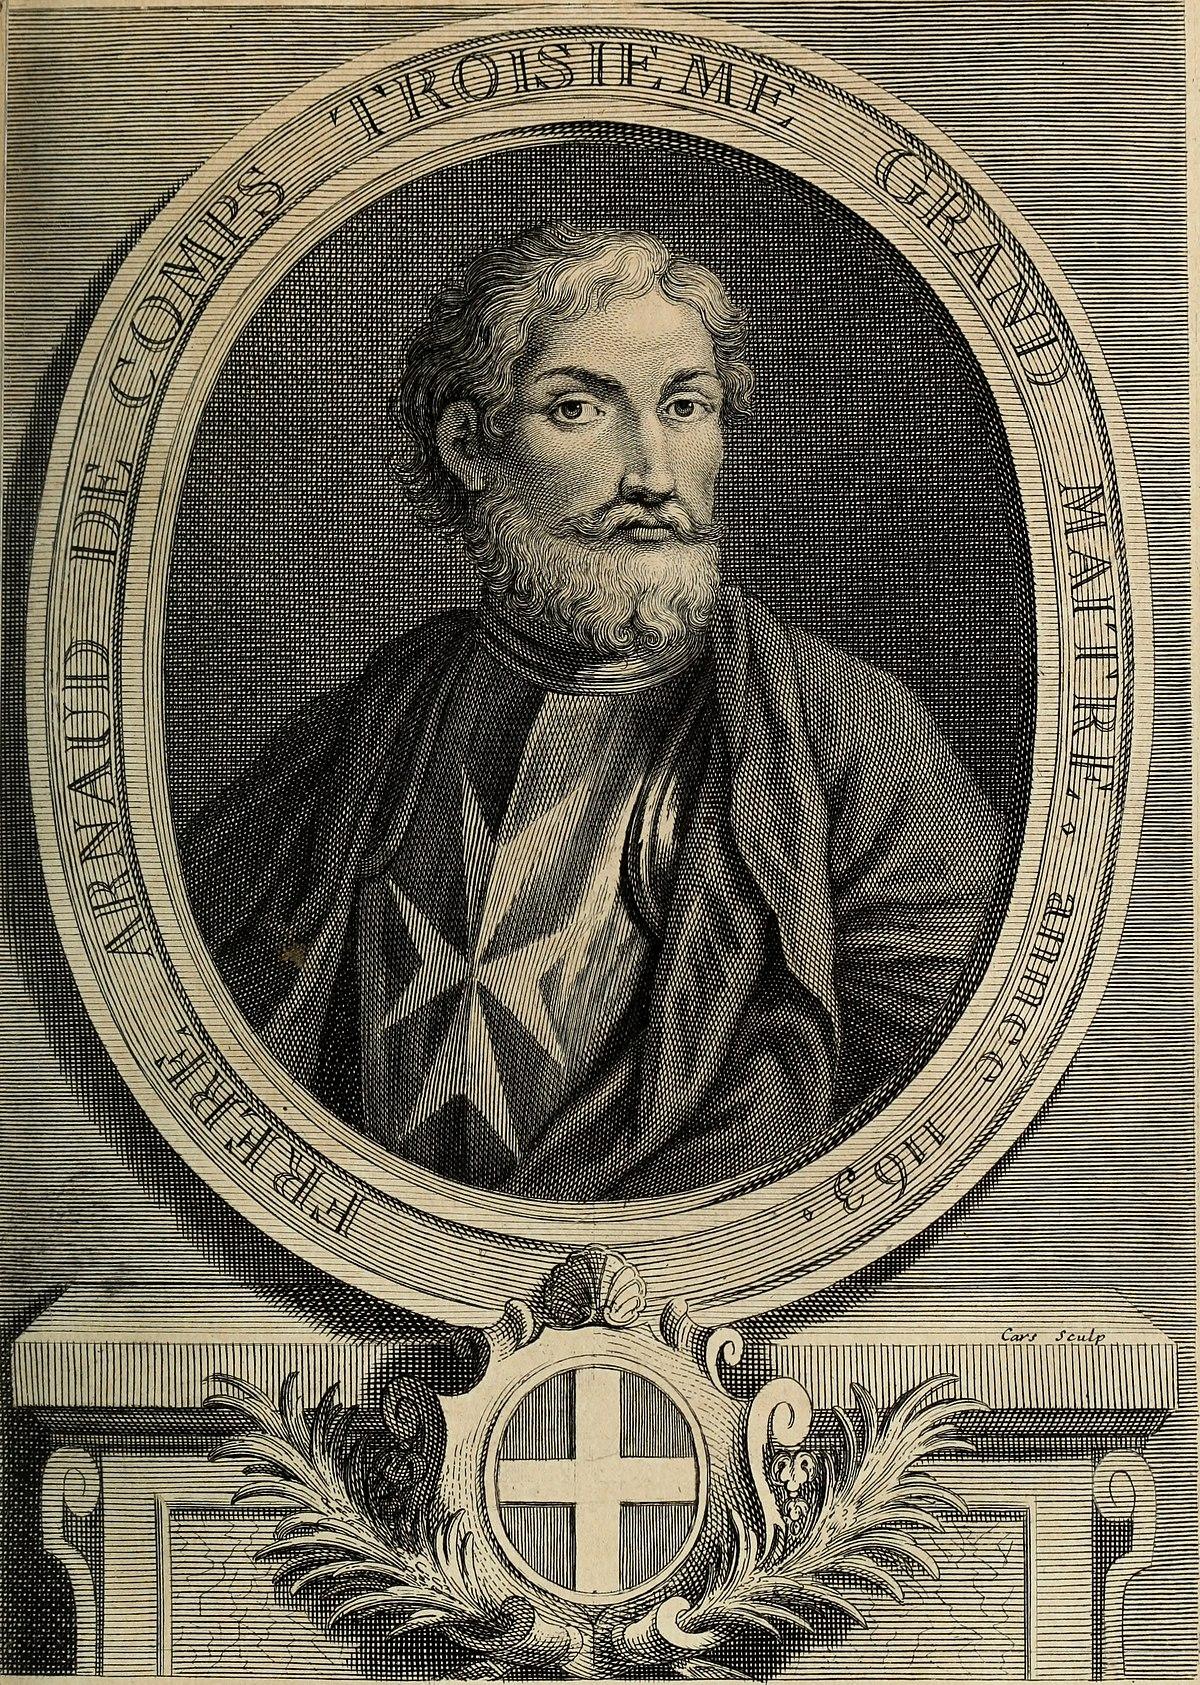 Arnaud de comps wikidata Histoire des jardins wikipedia